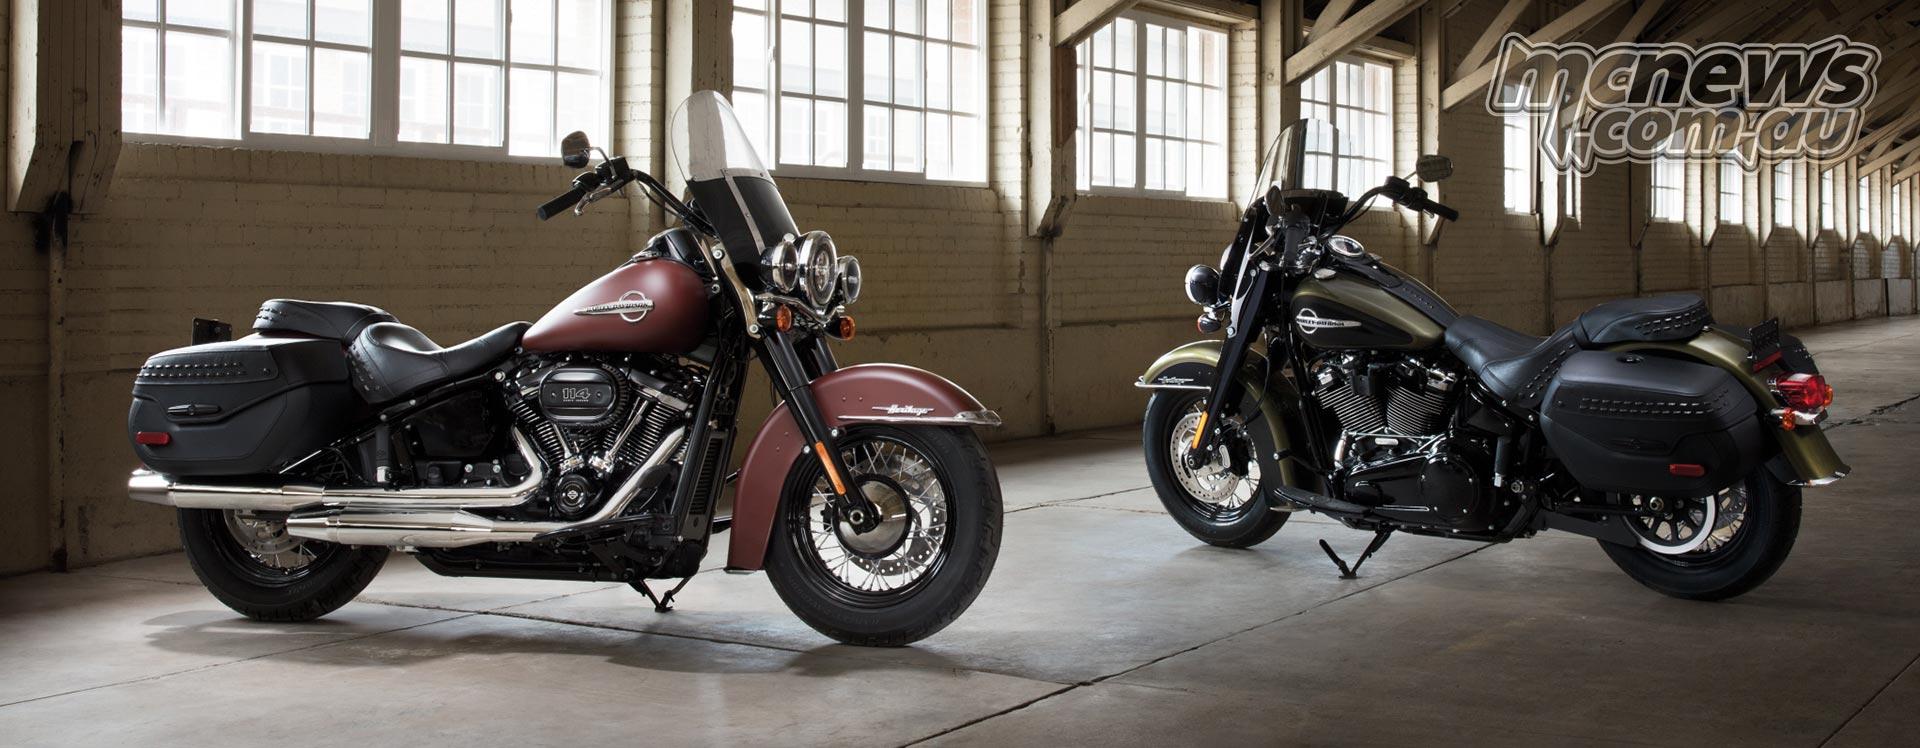 2018 Harley-Davidson Range | 8 New Softails | 114c i  | MCNews com au